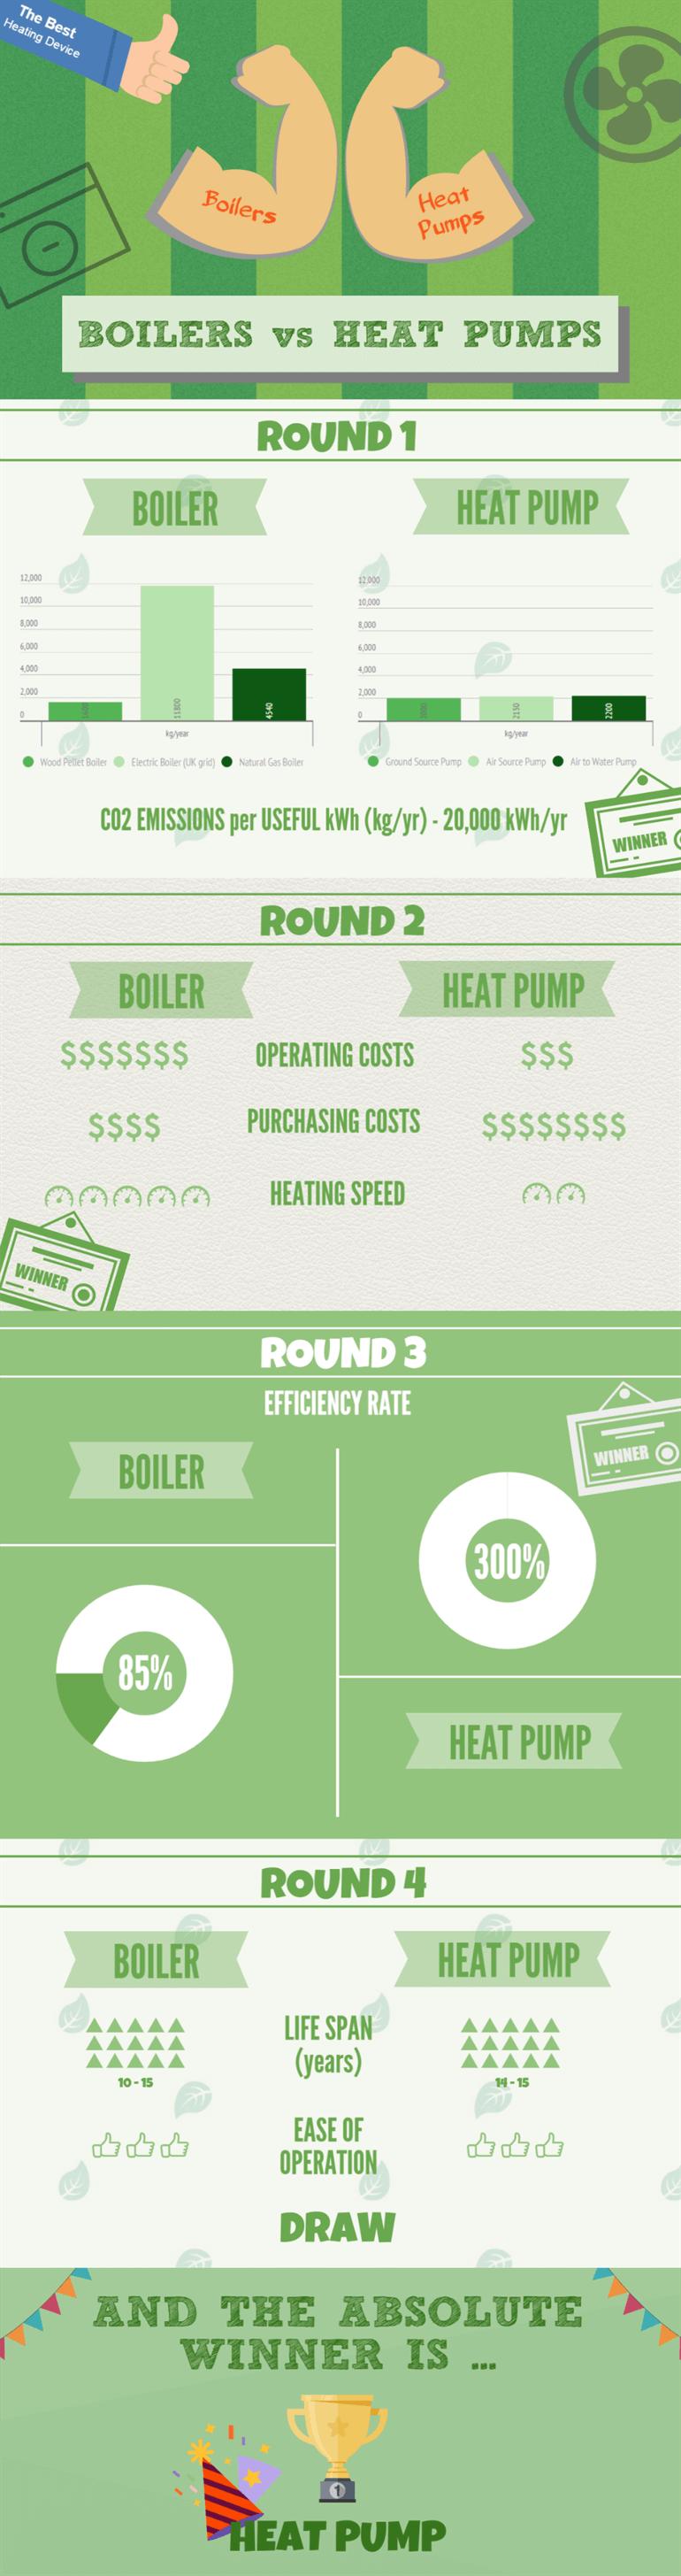 Boilers vs Heat Pumps Comparison (2020) GreenMatch in